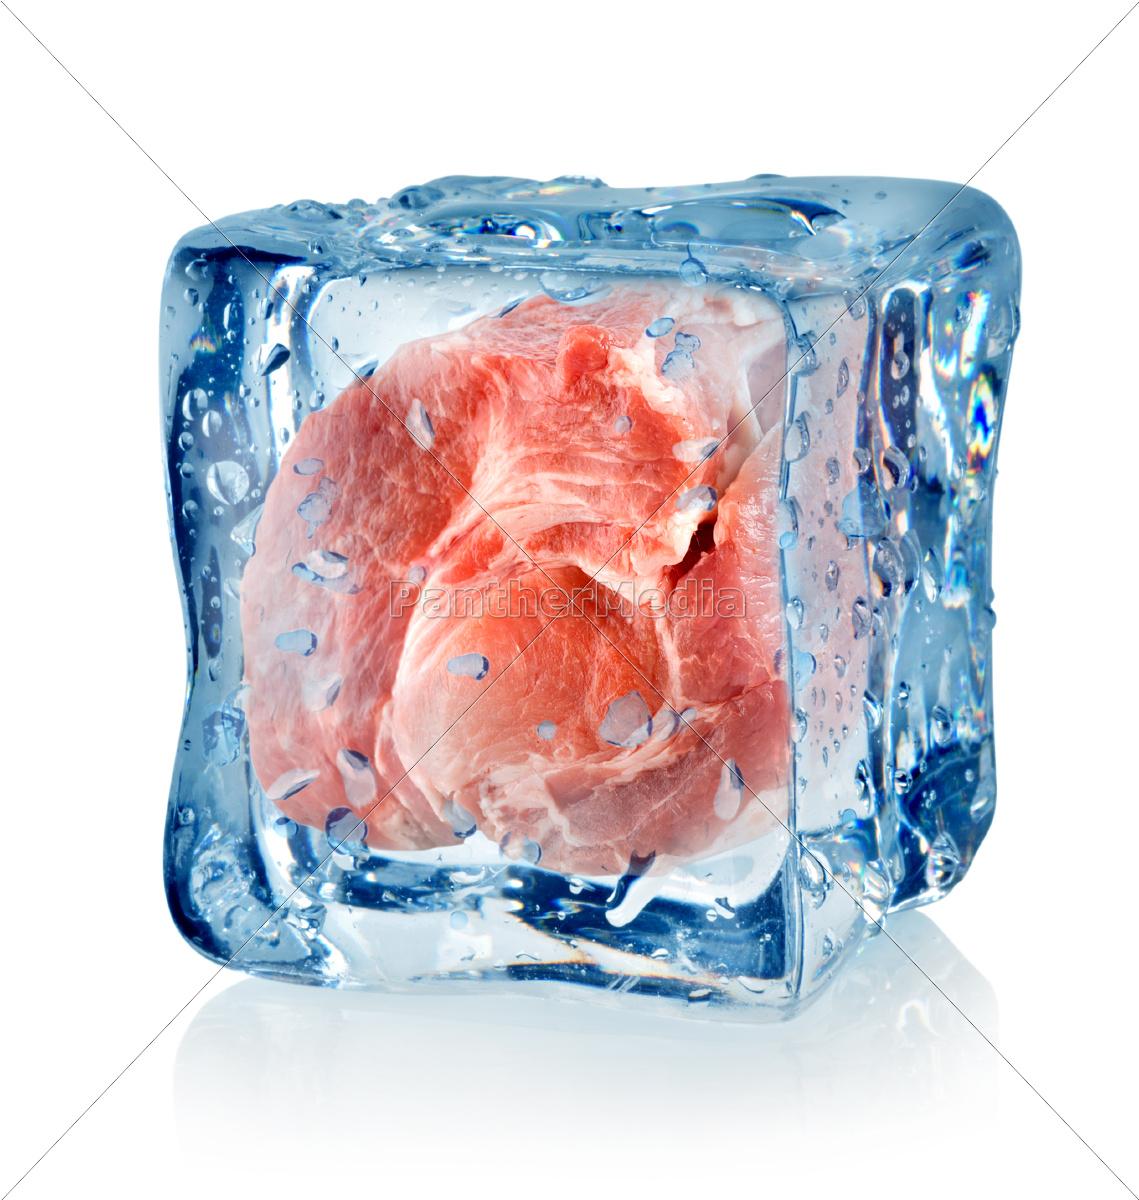 ice, cube, and, pork - 10125749